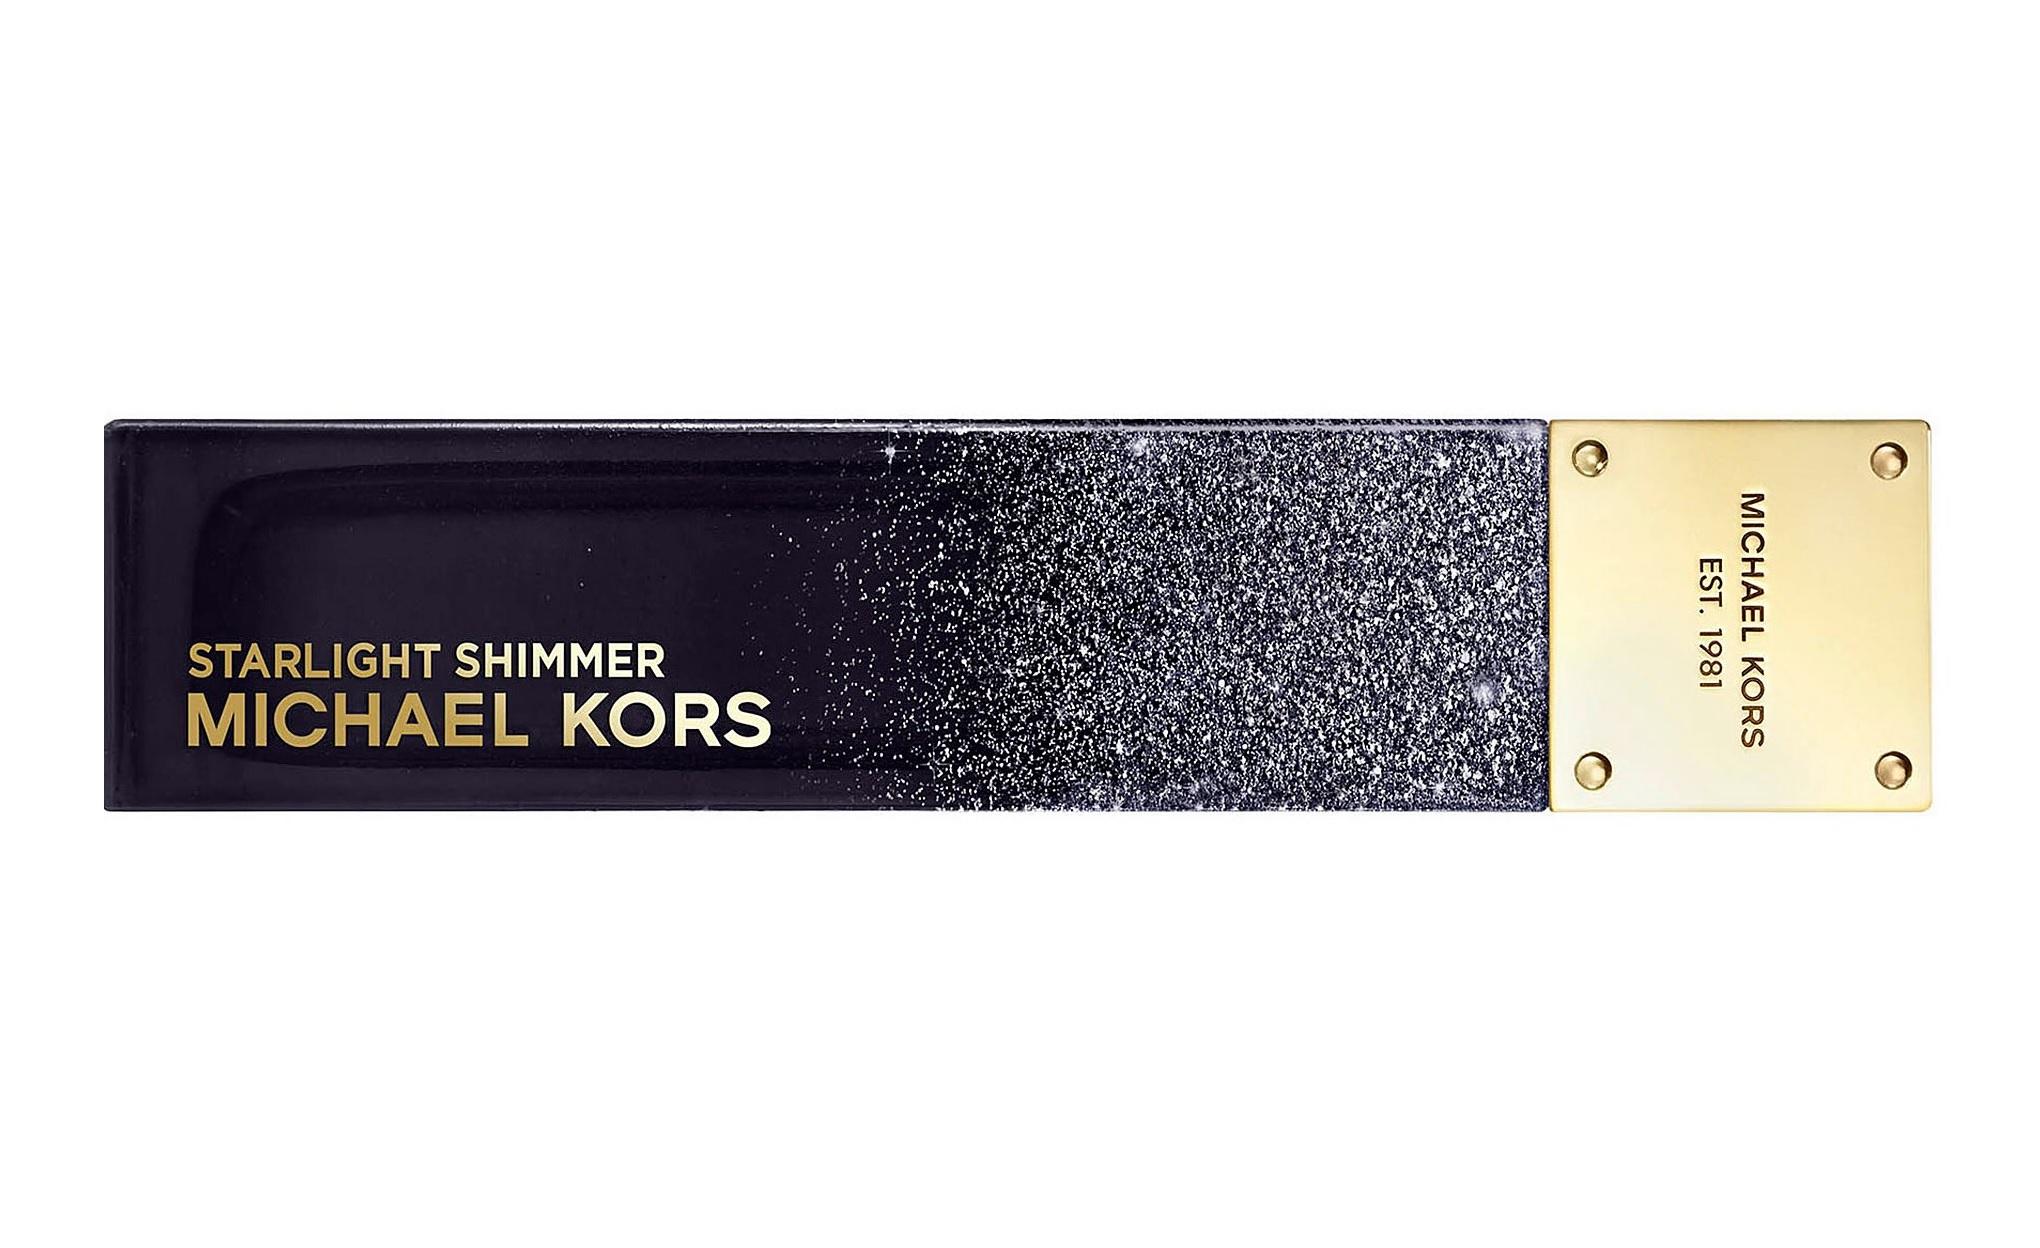 Michael Kors Starlight Shimmer